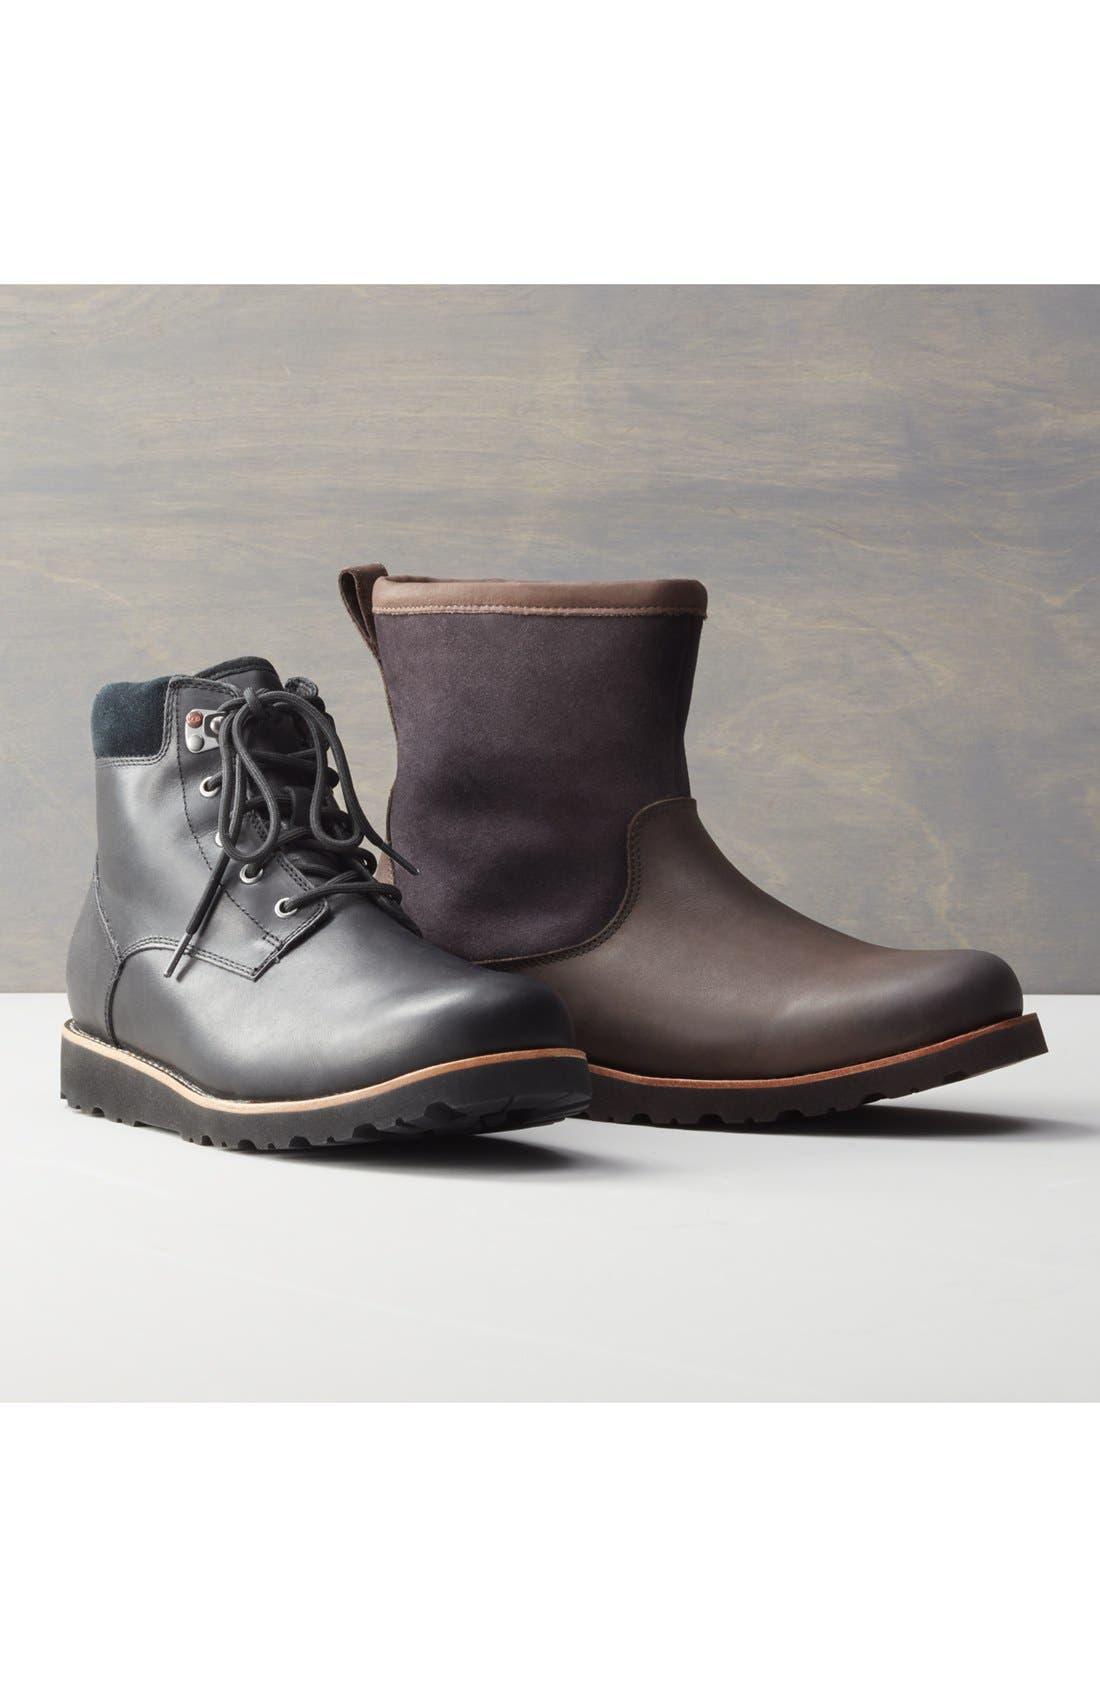 Seton Waterproof Chukka Boot,                             Alternate thumbnail 7, color,                             WHEAT